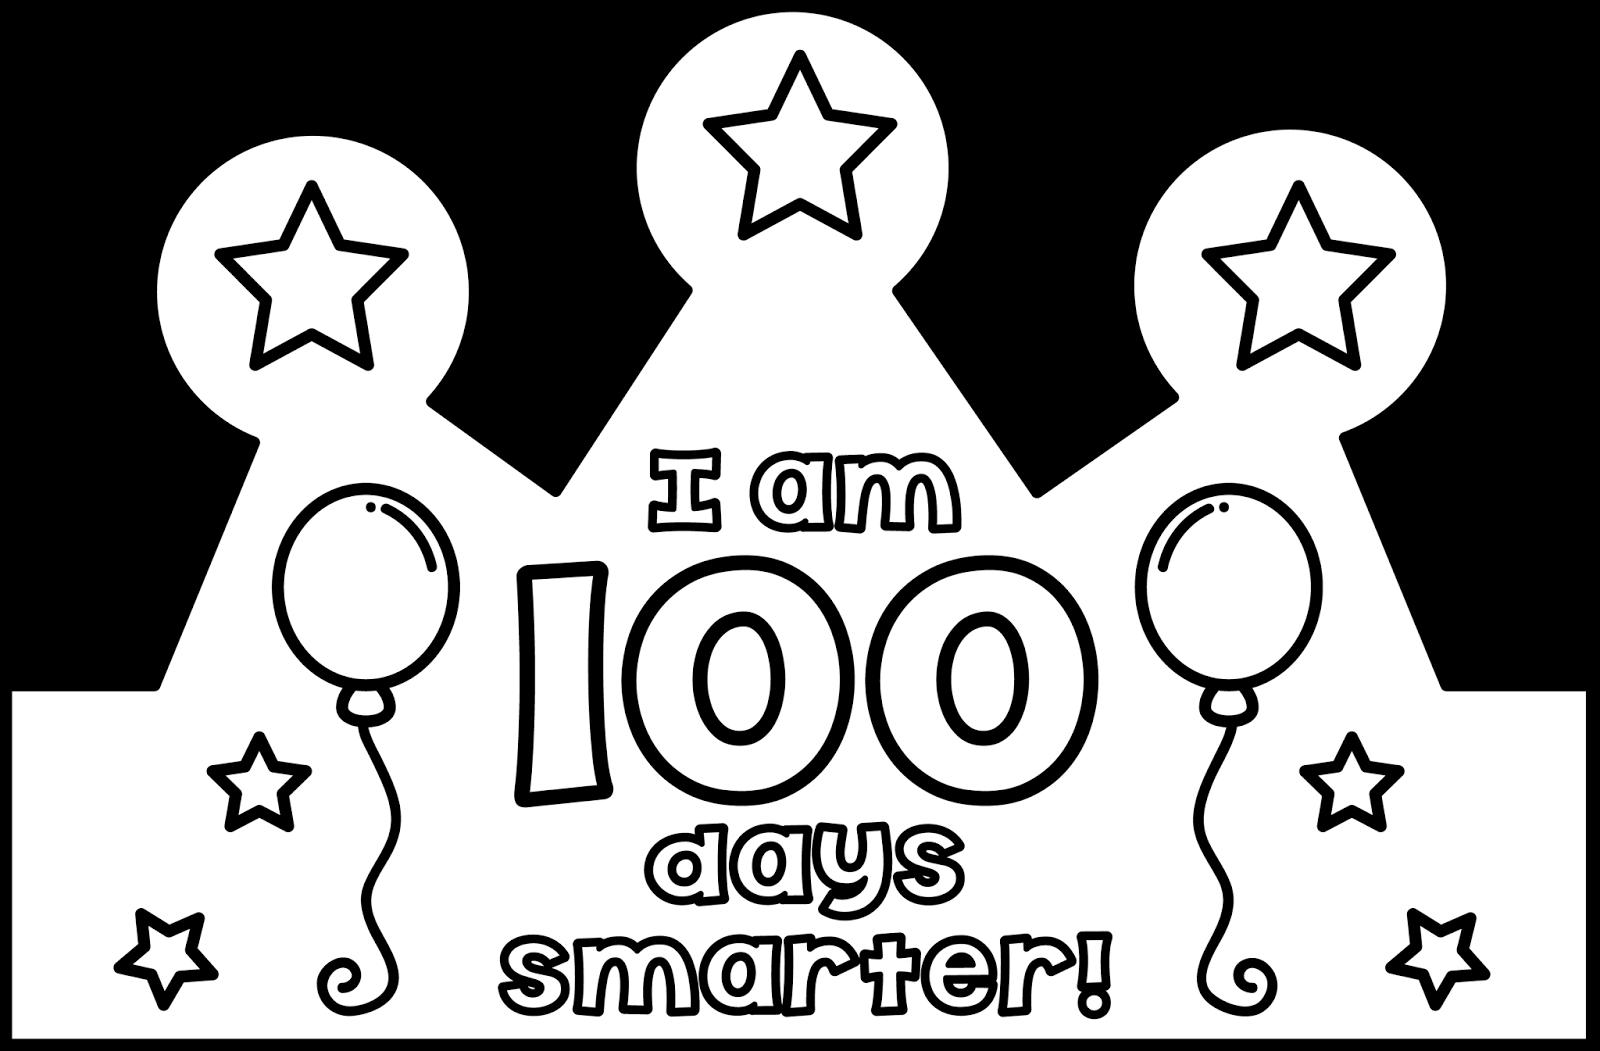 vector download 100 clipart 100 days smart. Free download clip art